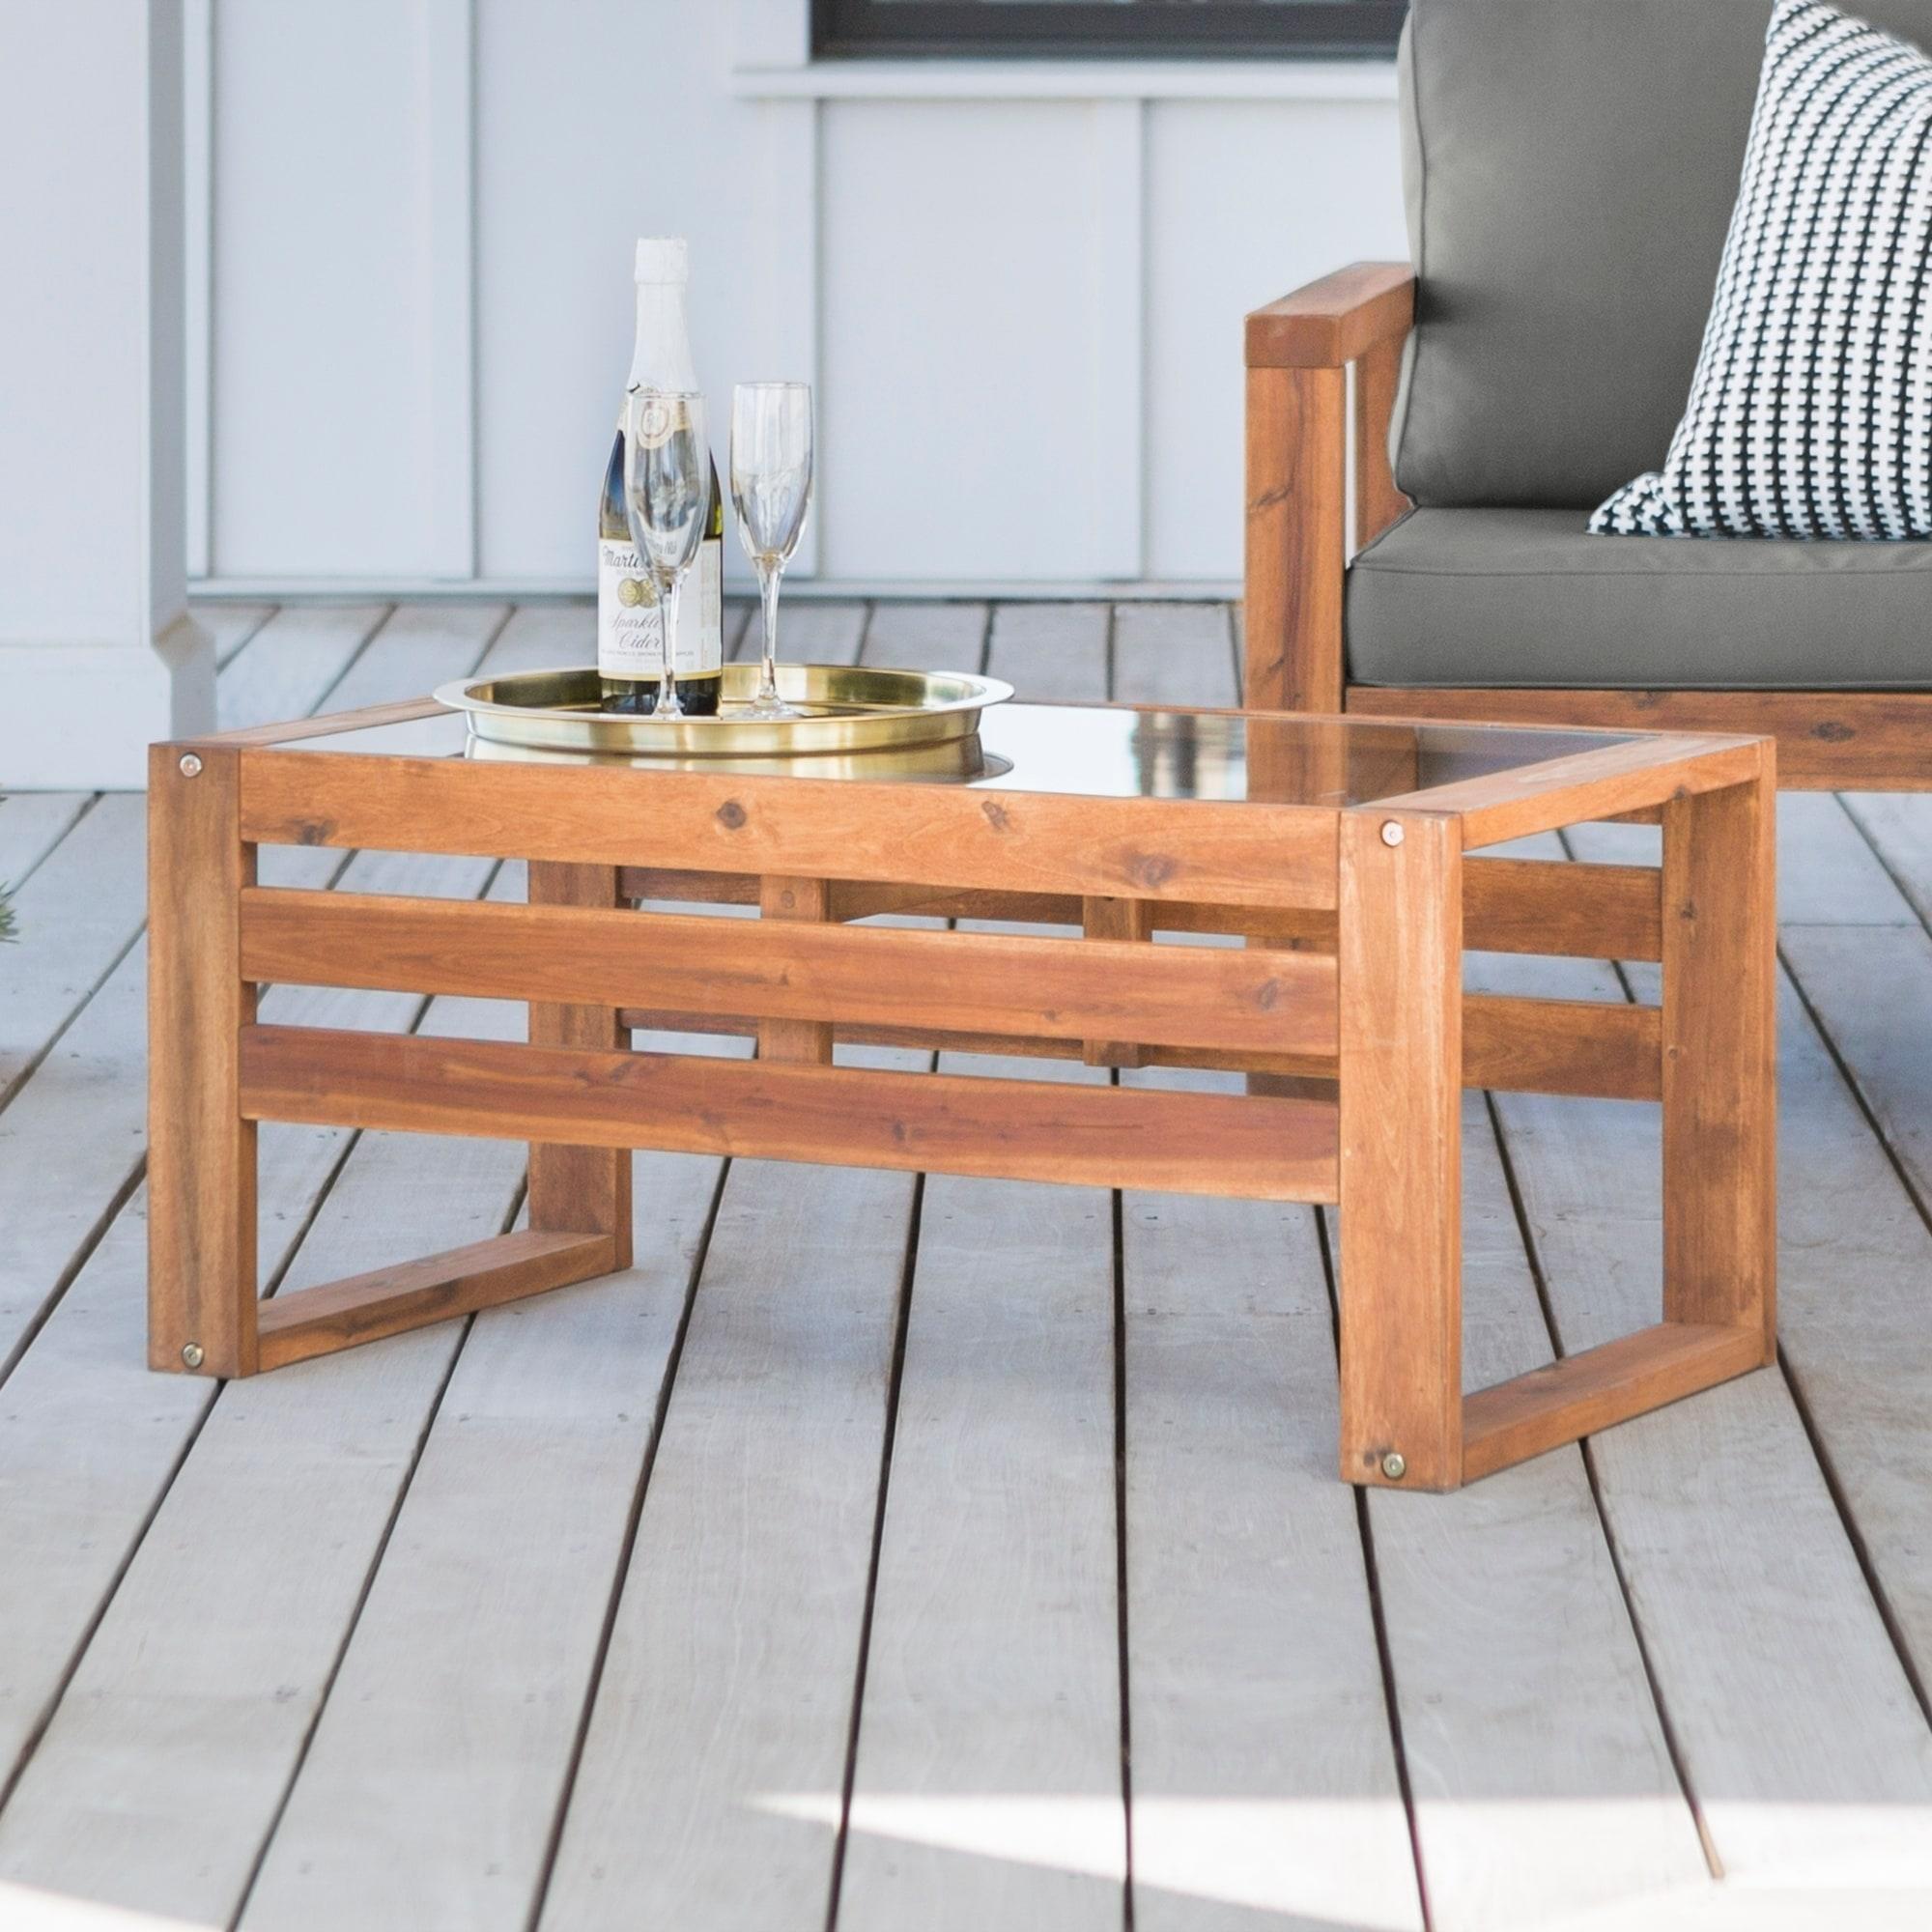 Hudson Acacia Outdoor Coffee Table 36 X 20 16h